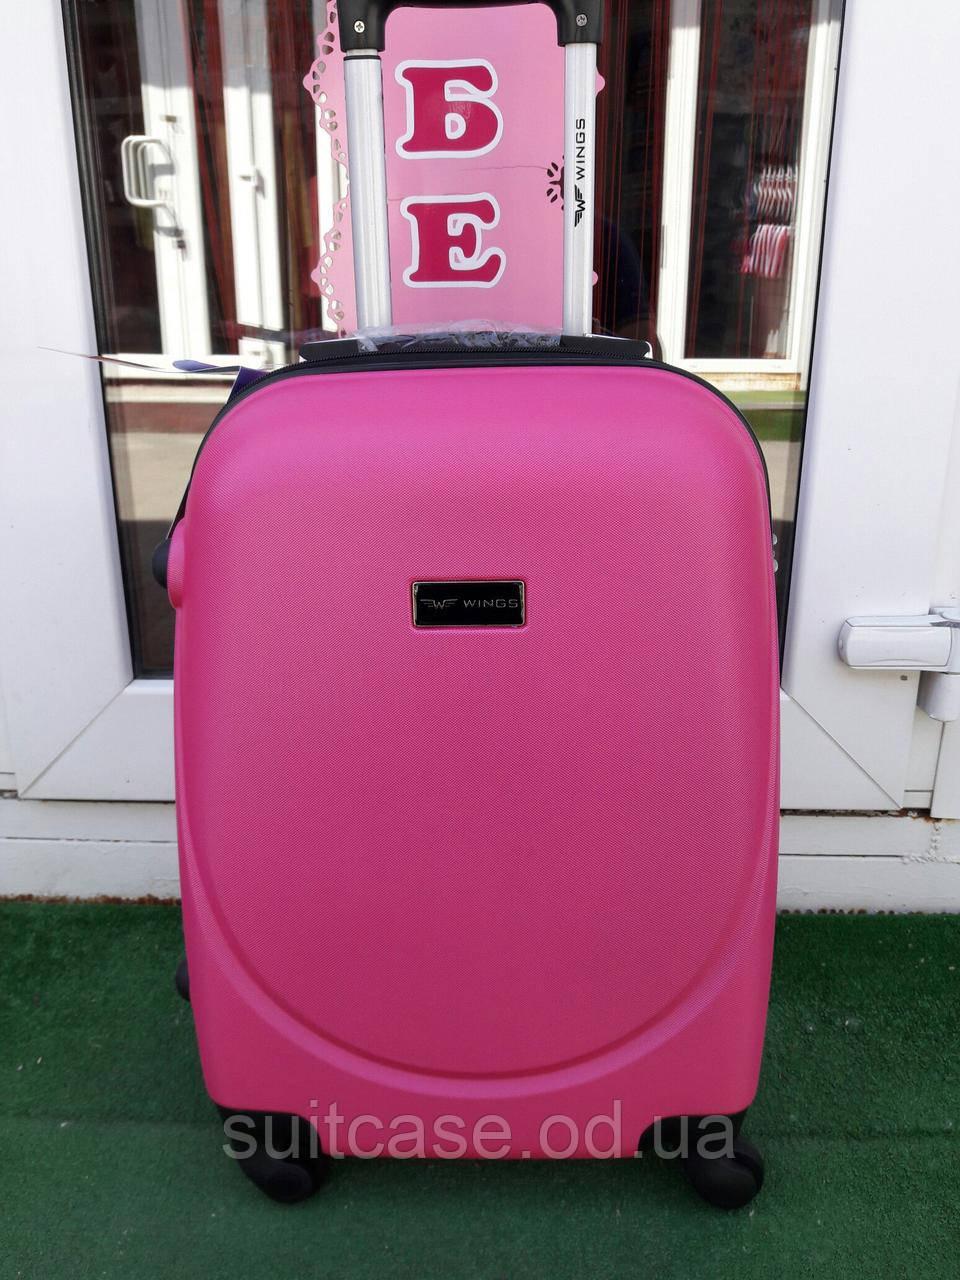 Малый пластиковый чемодан на четырёх колёсах WINGS - Интернет-магазин